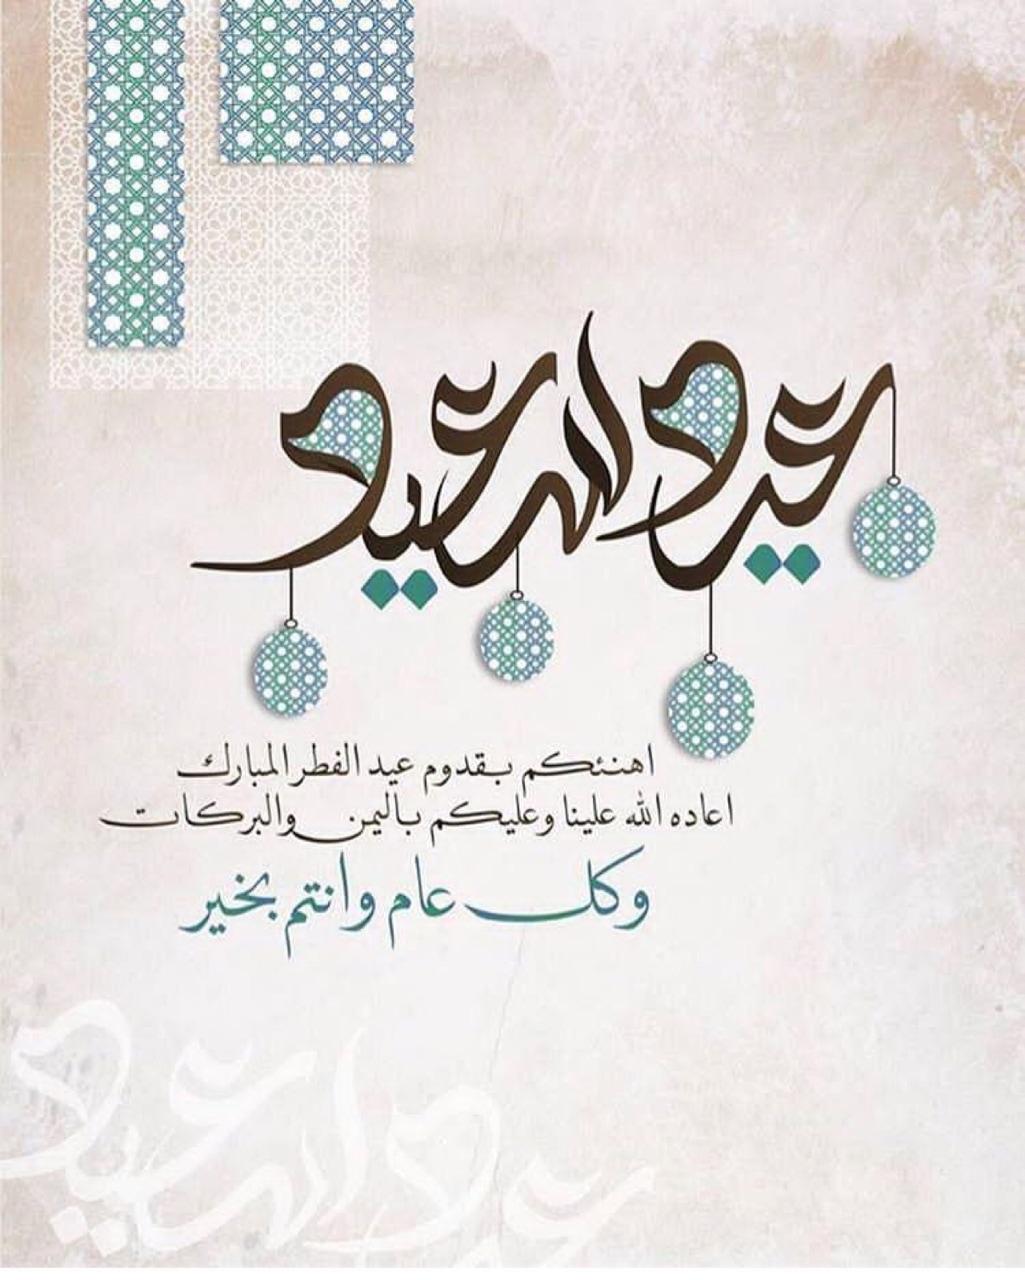 عيد مبارك Projects Photos Videos